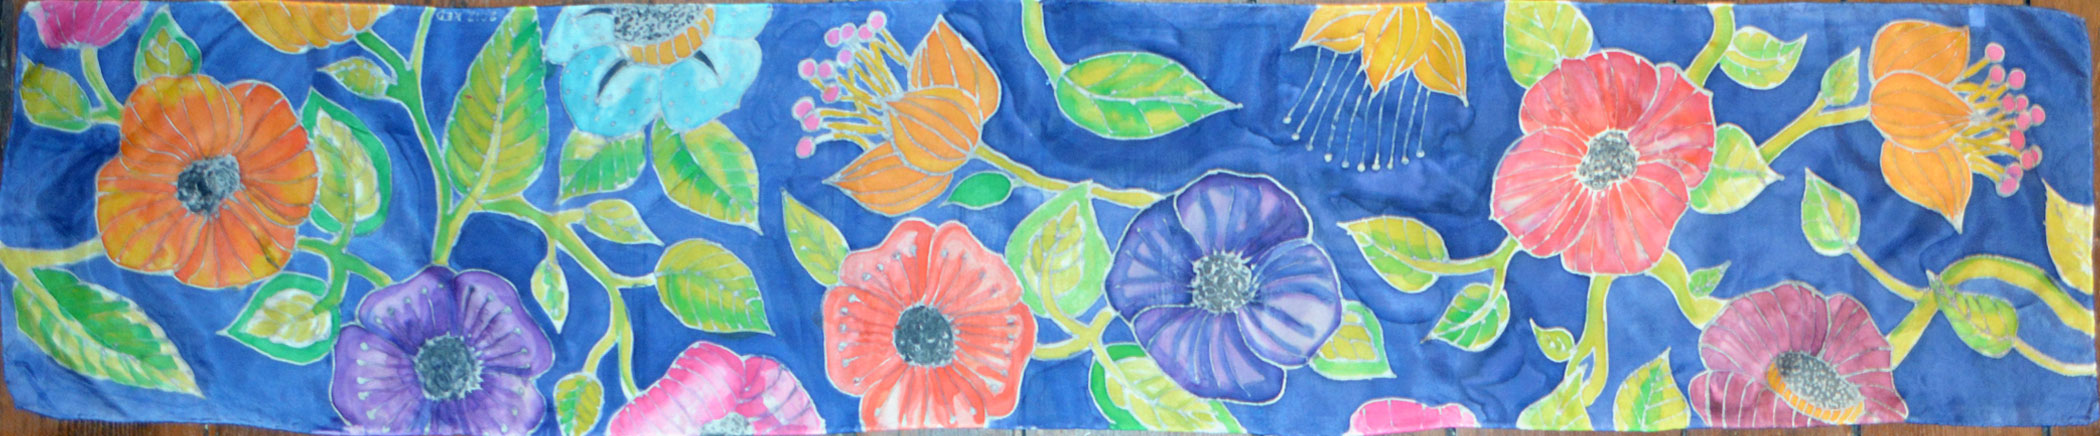 Silk Painting Kate Disbrow Creative Communications Design